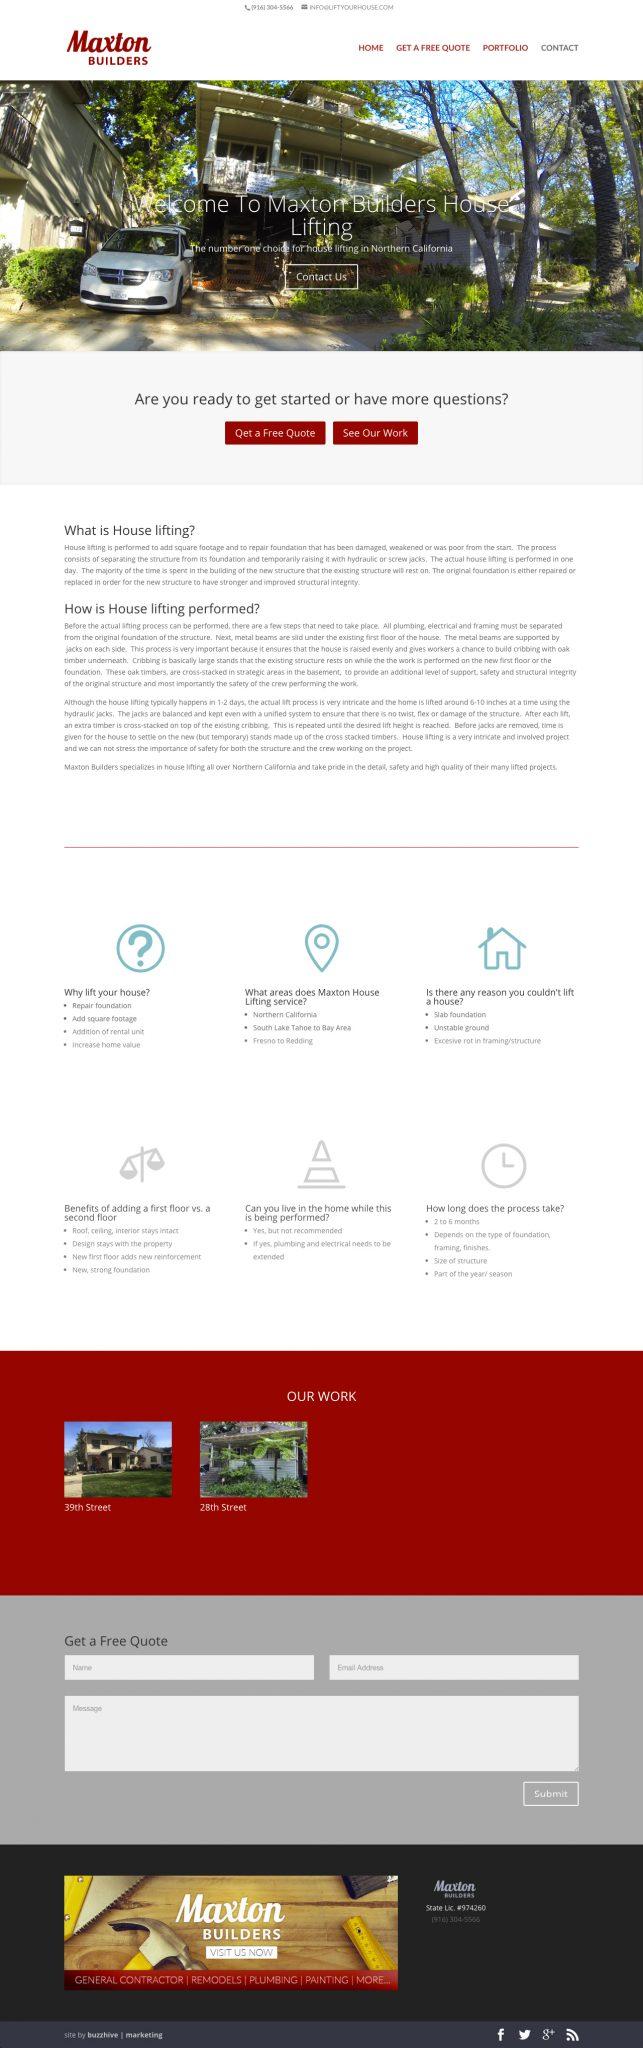 LiftYourHouse.com_ Web Design & Development